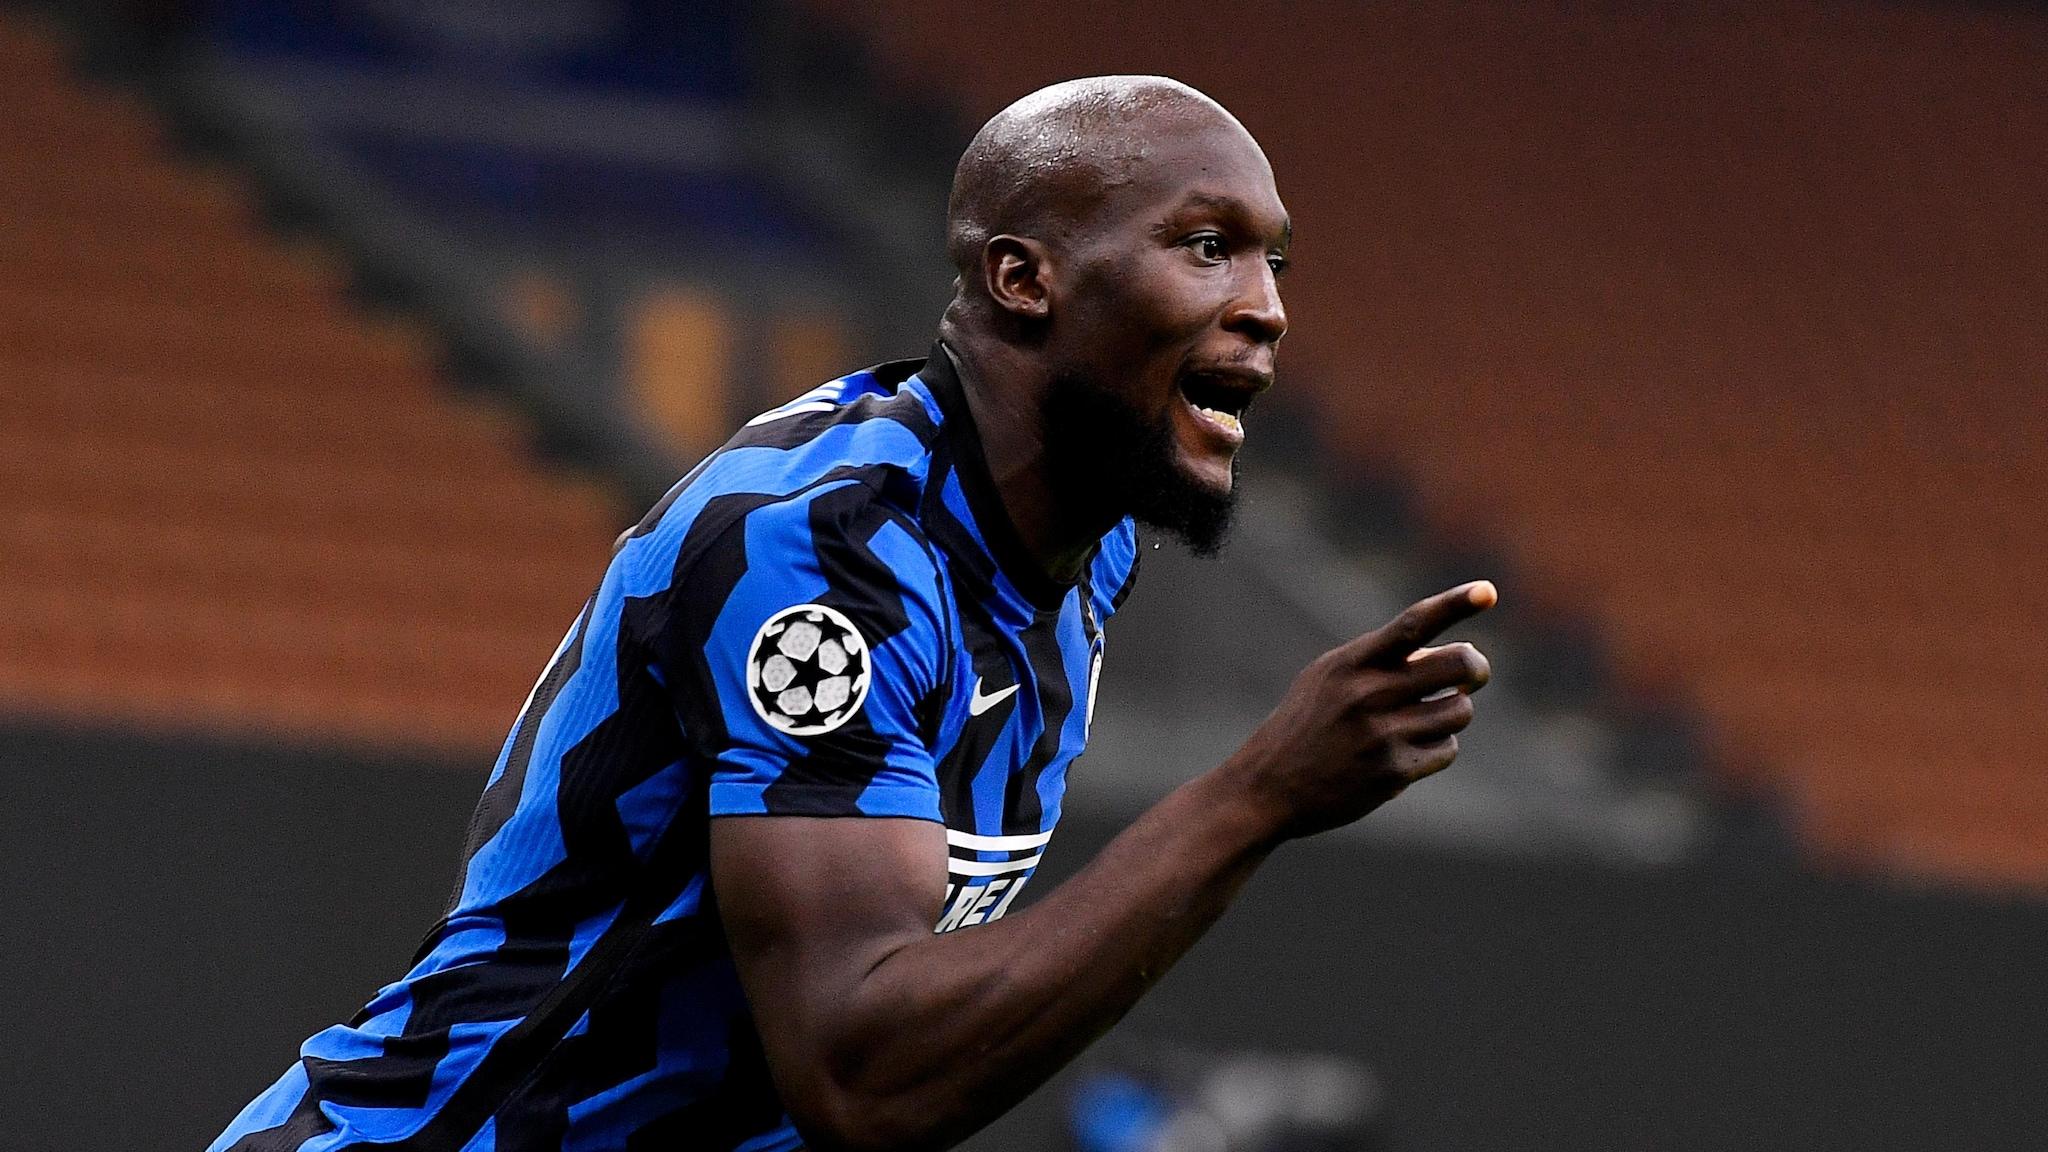 lukaku: 2020'nin en iyi uefa golcüsü